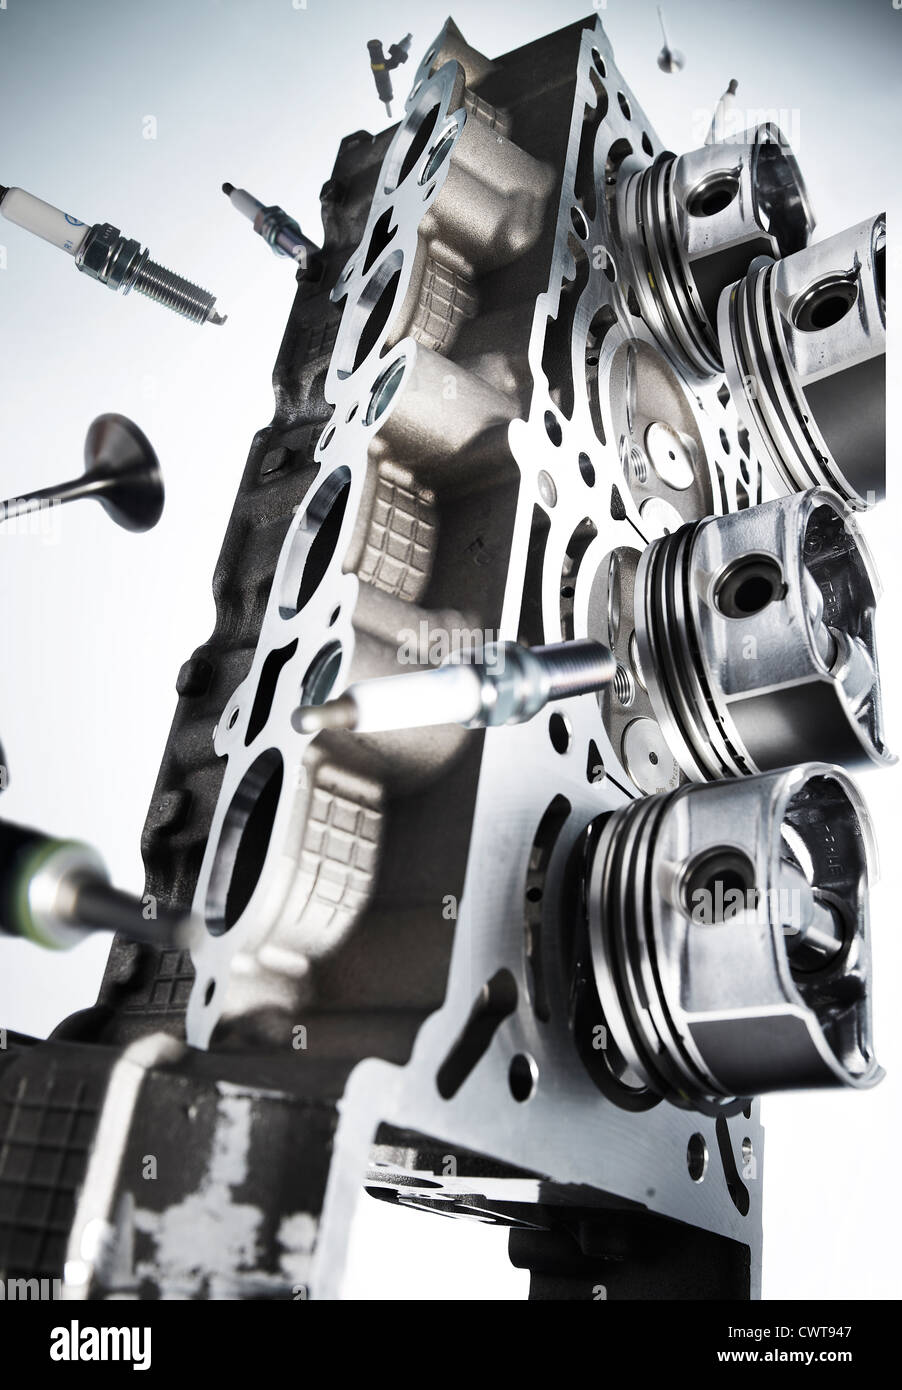 Nett Automotor Teile Ideen - Der Schaltplan - raydavisrealtor.info